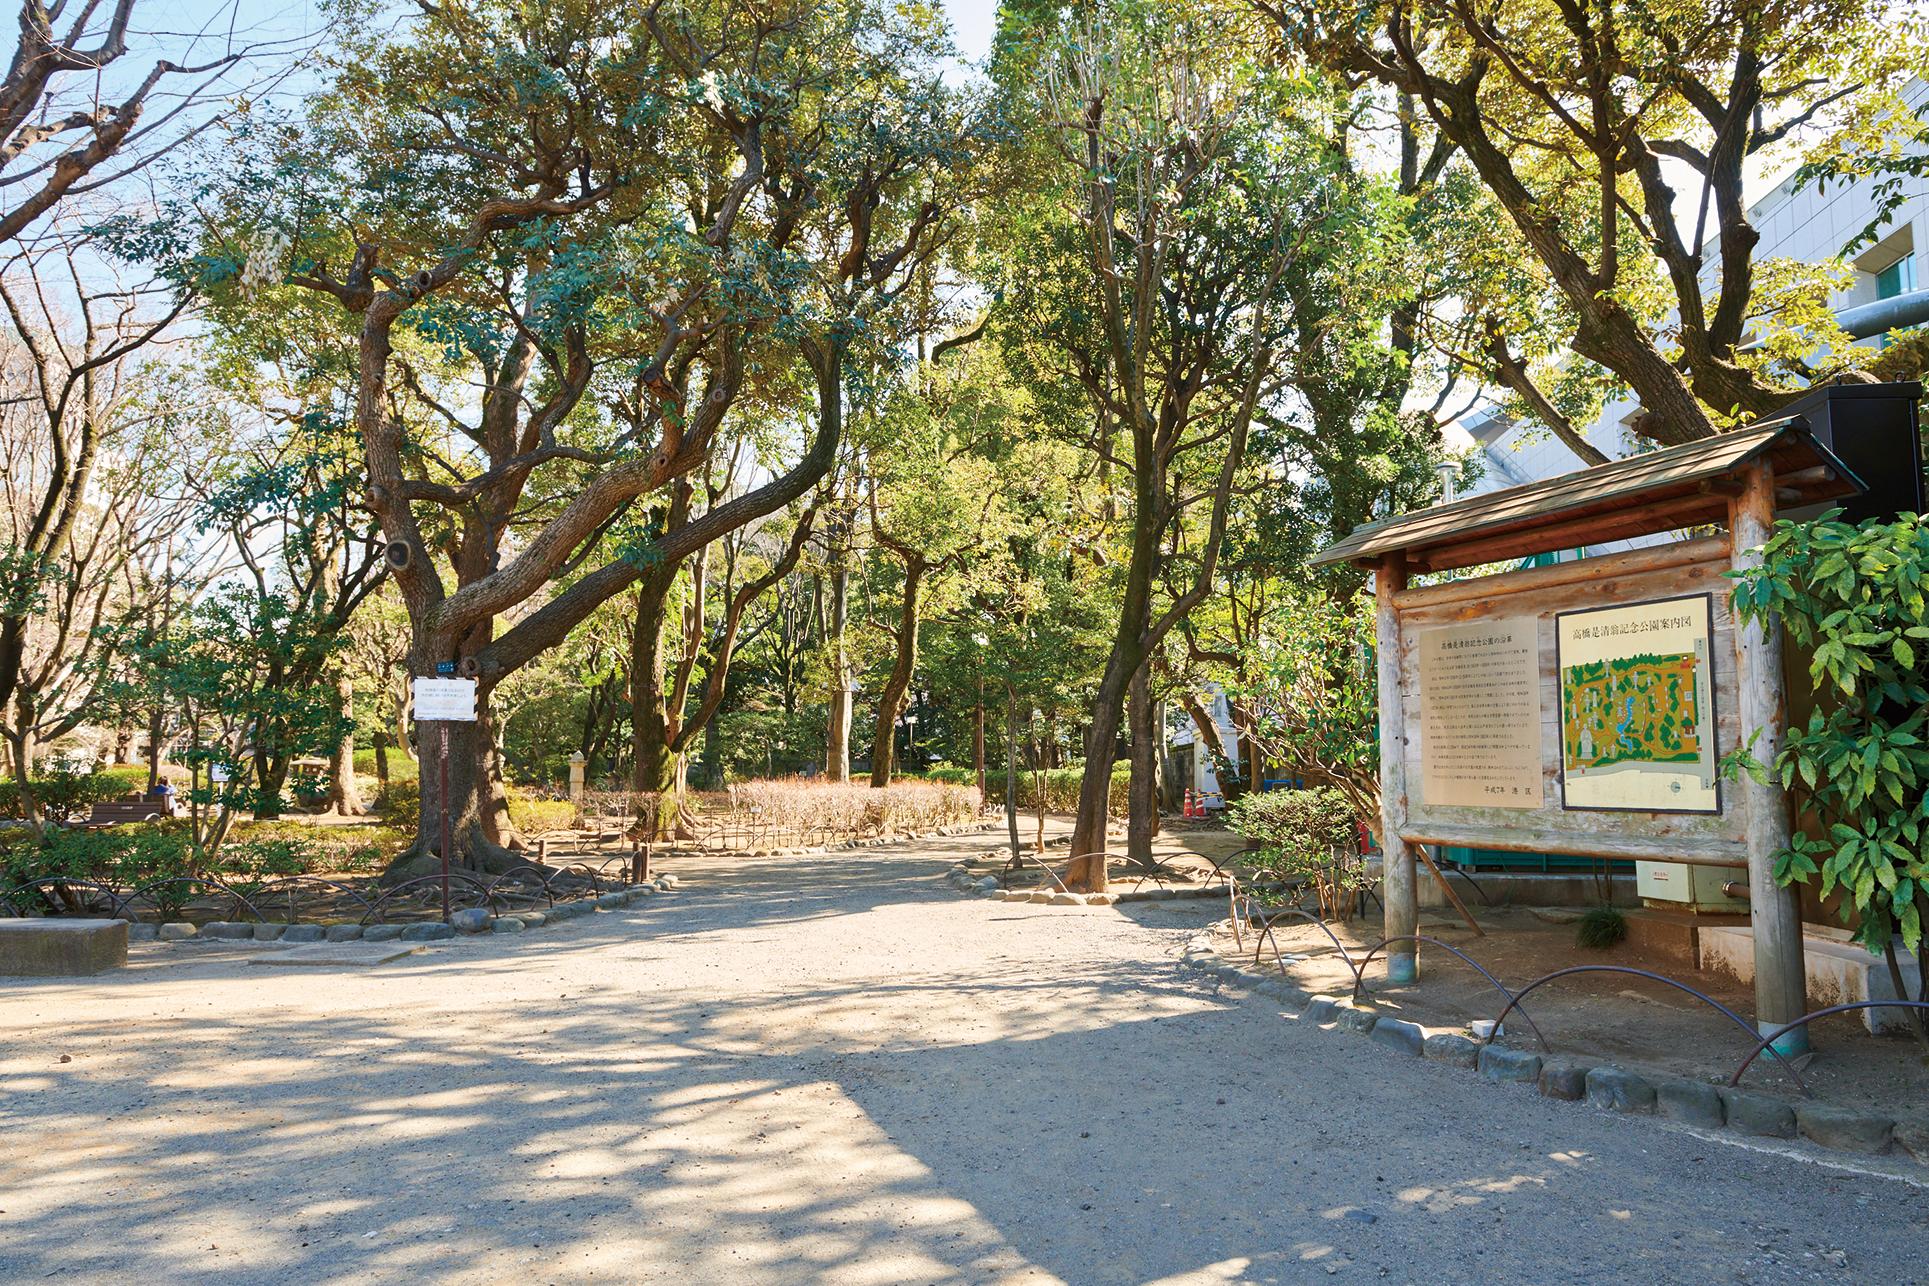 港区ー憩いの場 今昔STORY 第1回 高橋是清翁記念公園